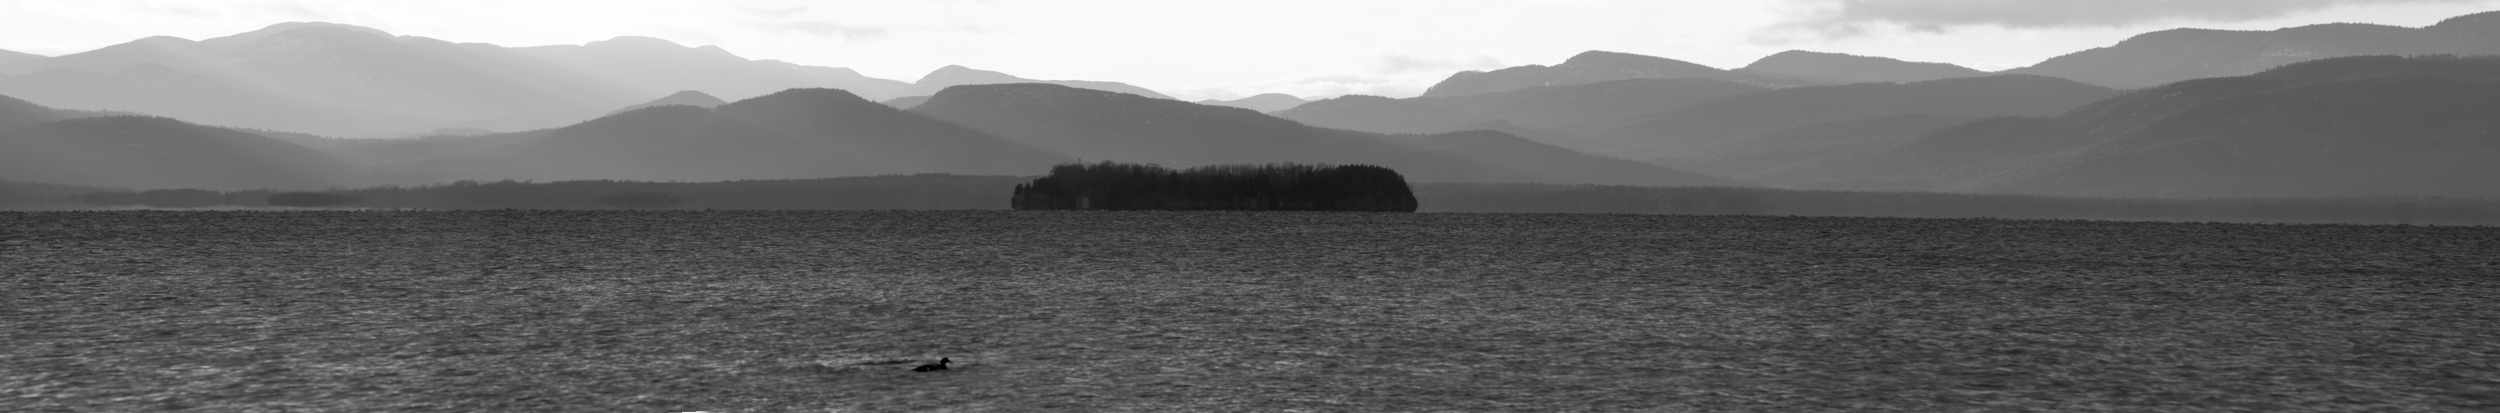 Juniper__and_Adirondack-